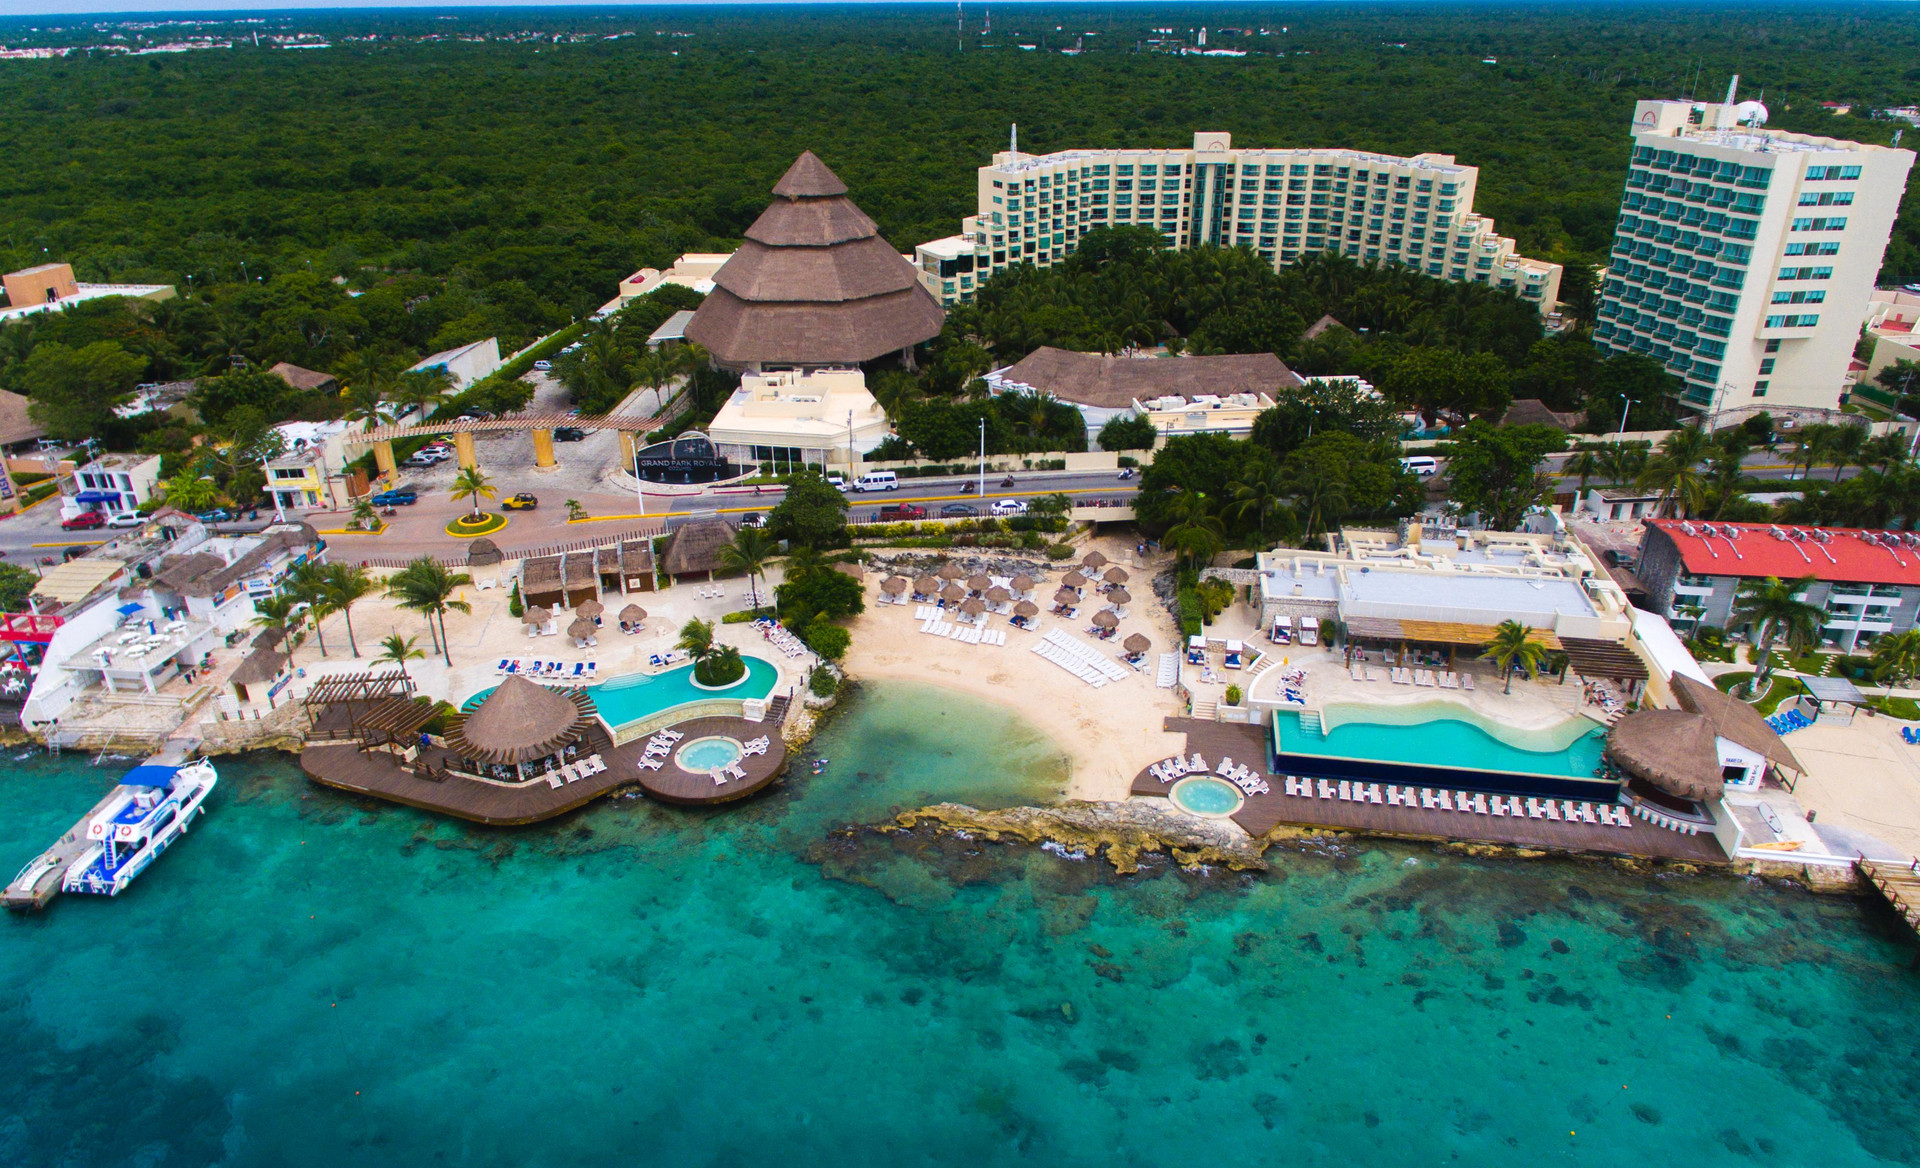 HOTELES EN COZUMEL  travelviajescommx